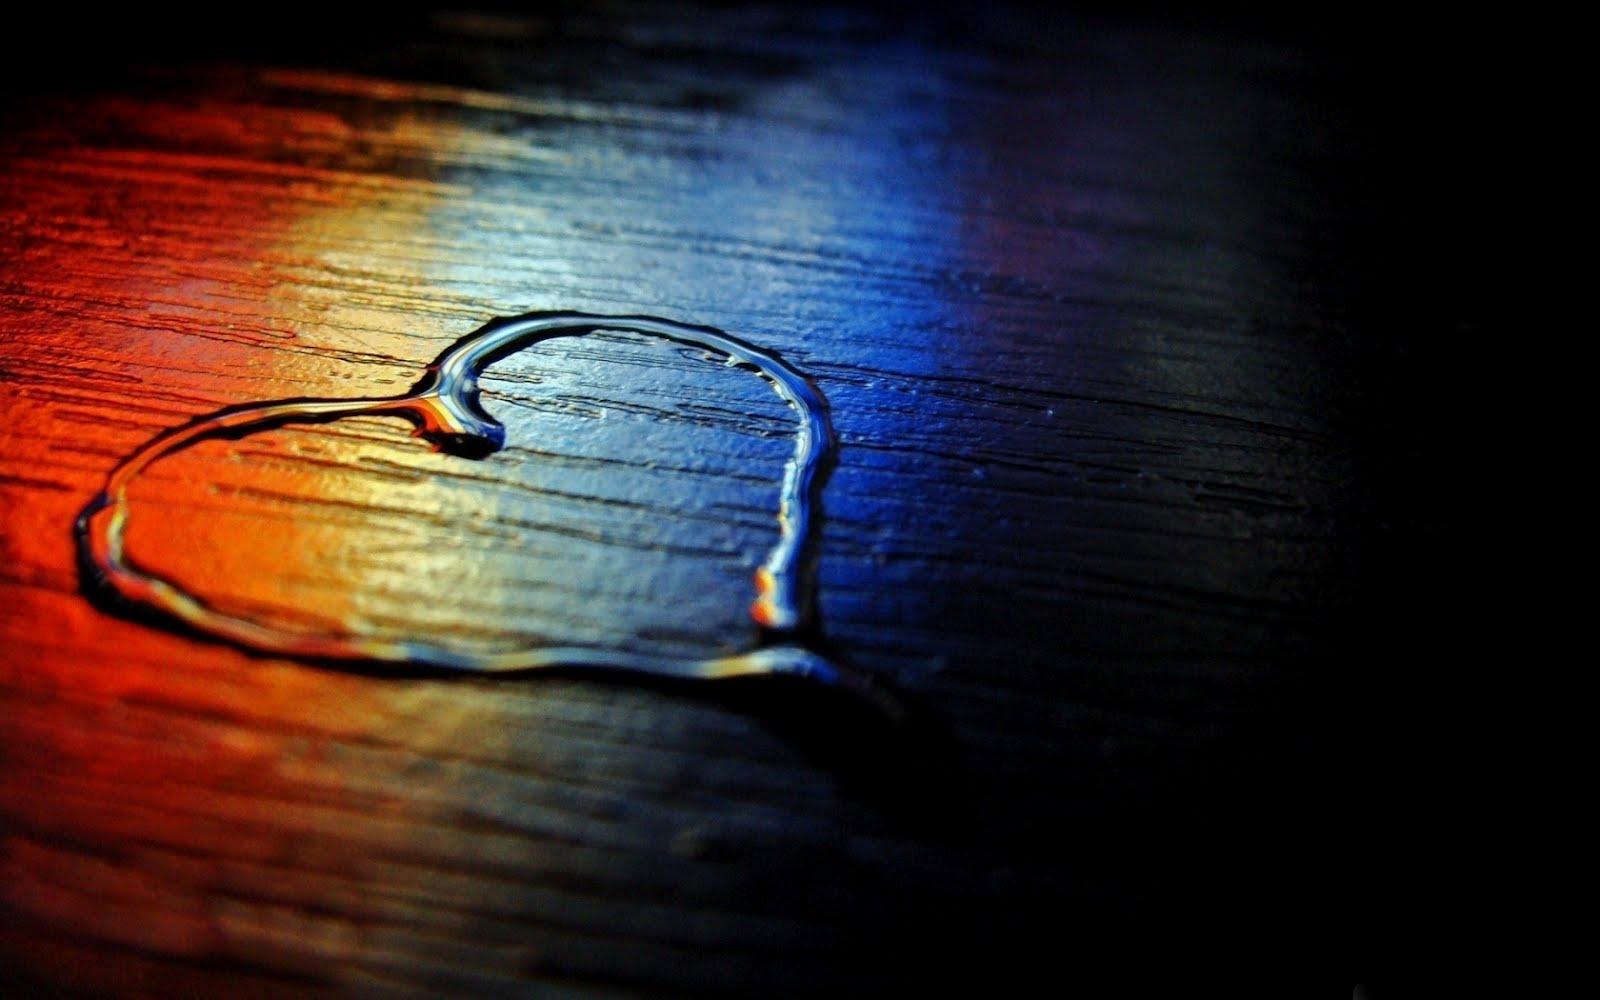 http://3.bp.blogspot.com/-j1l3d1b-cpo/UC7B56MzRwI/AAAAAAAACMA/wDfHue7RT8M/s1600/light_heart_water_rainbow_27143_1680x1050.jpg